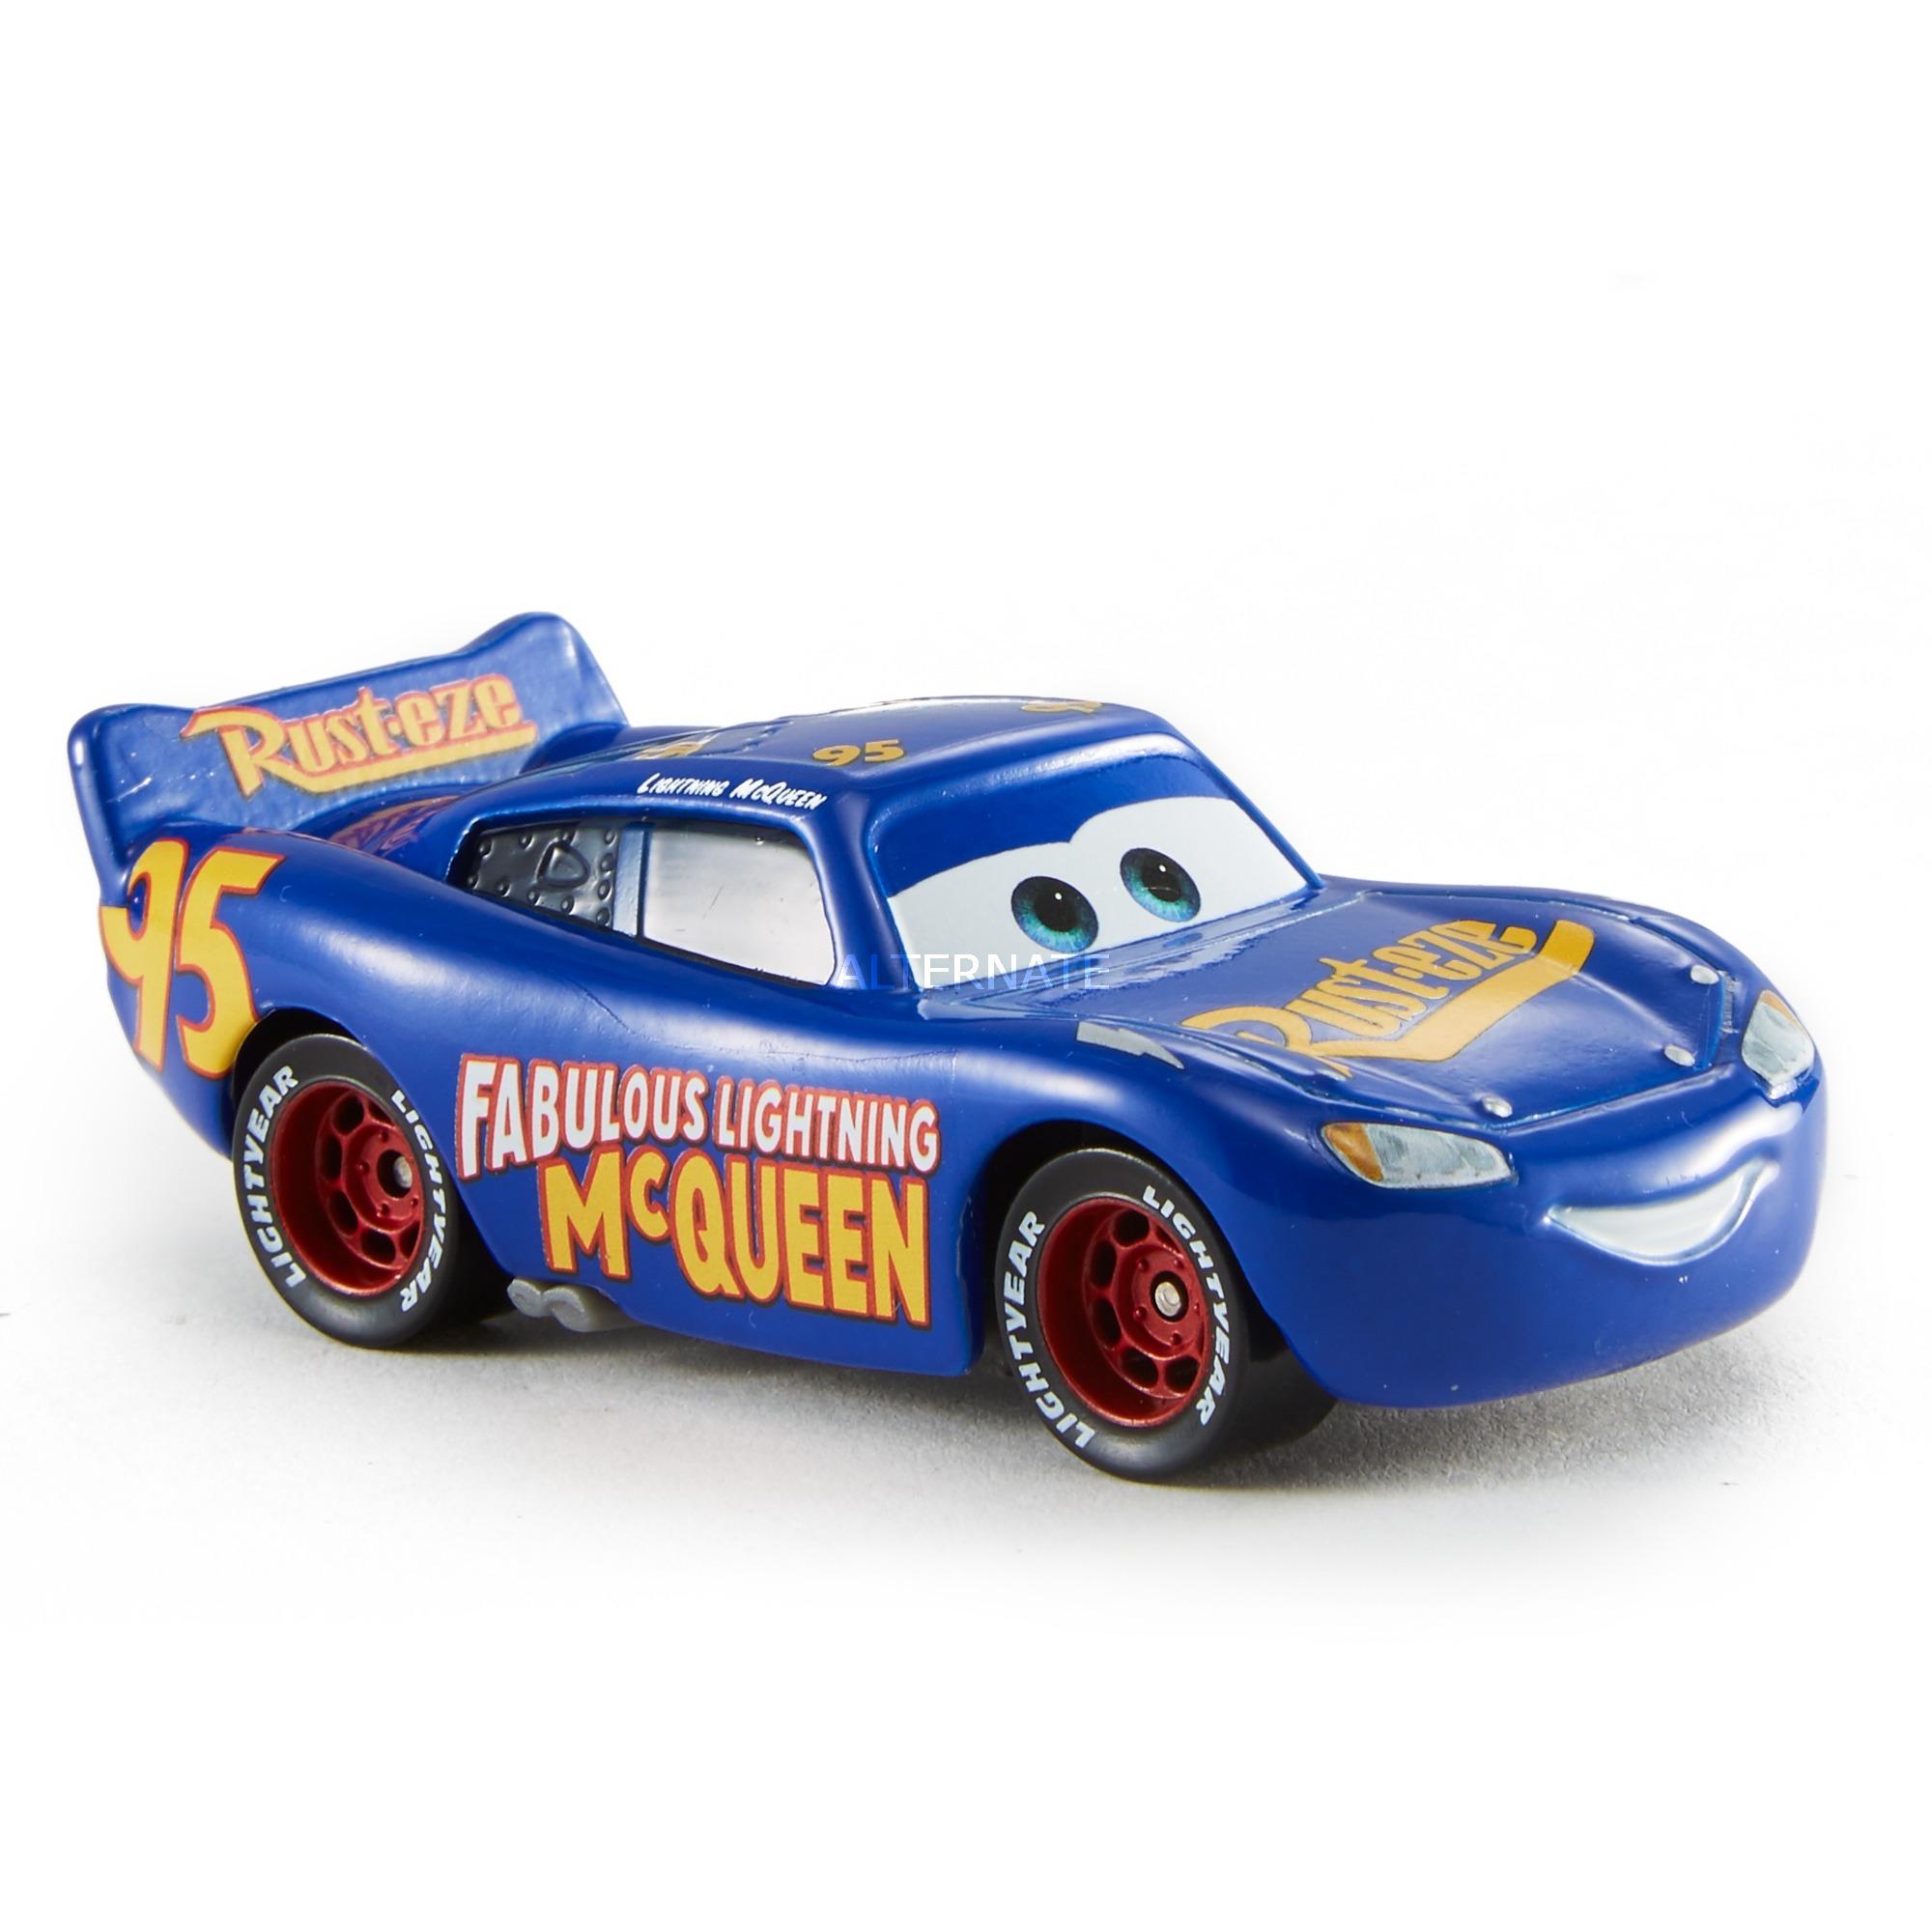 Mattel Disney Cars 3 Fabulous Lightning Mcqueen Spielfahrzeug Blau